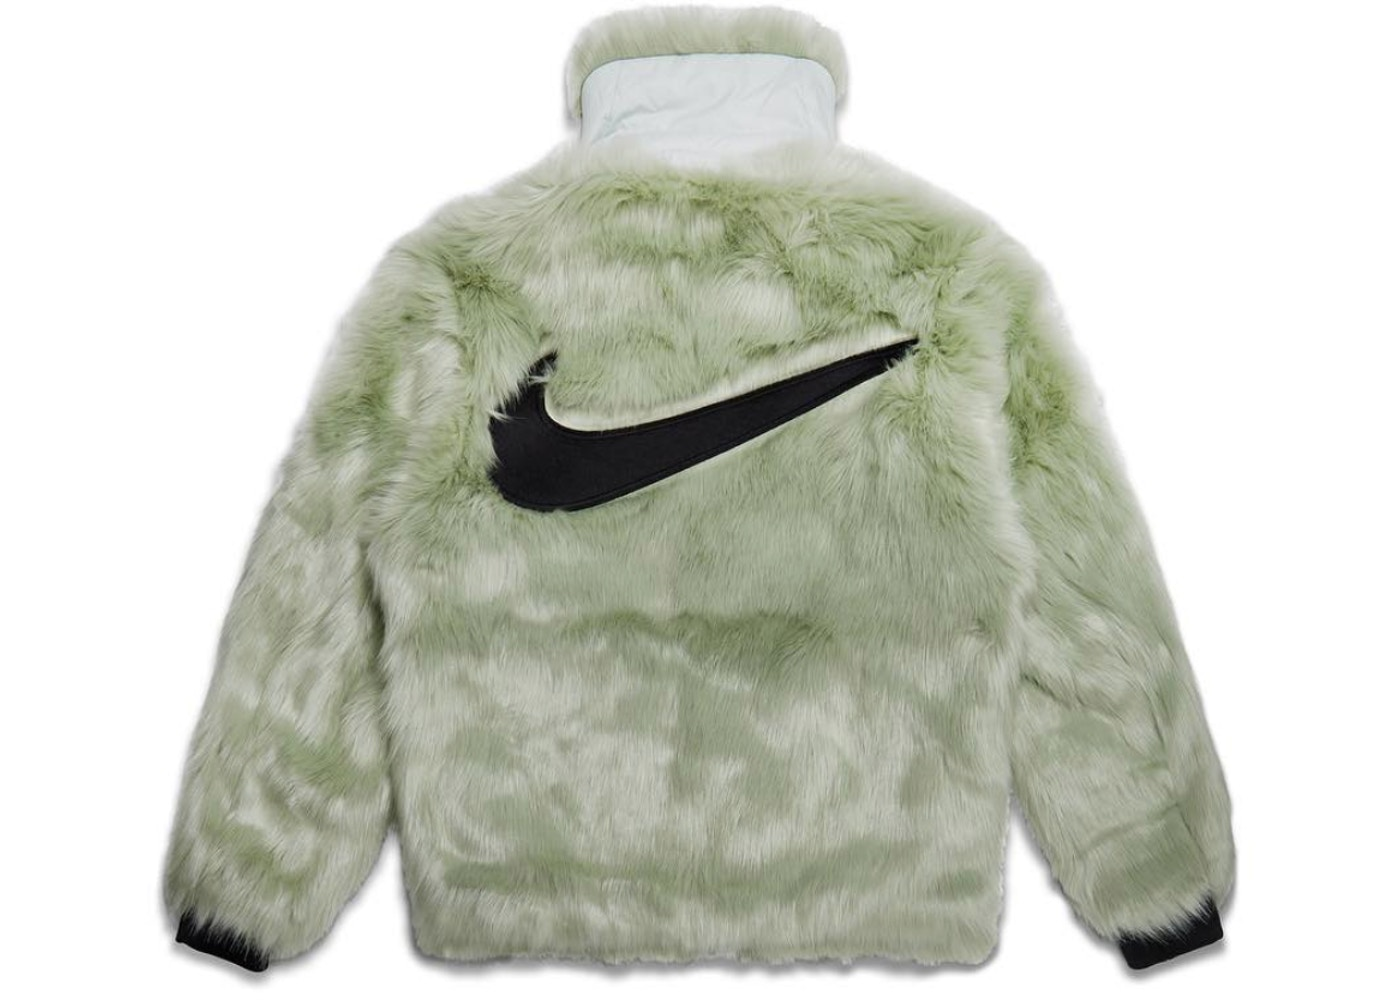 separation shoes 090ce 43beb Nike x Ambush Women s Reversible Faux Fur Coat Jade Horizon Black